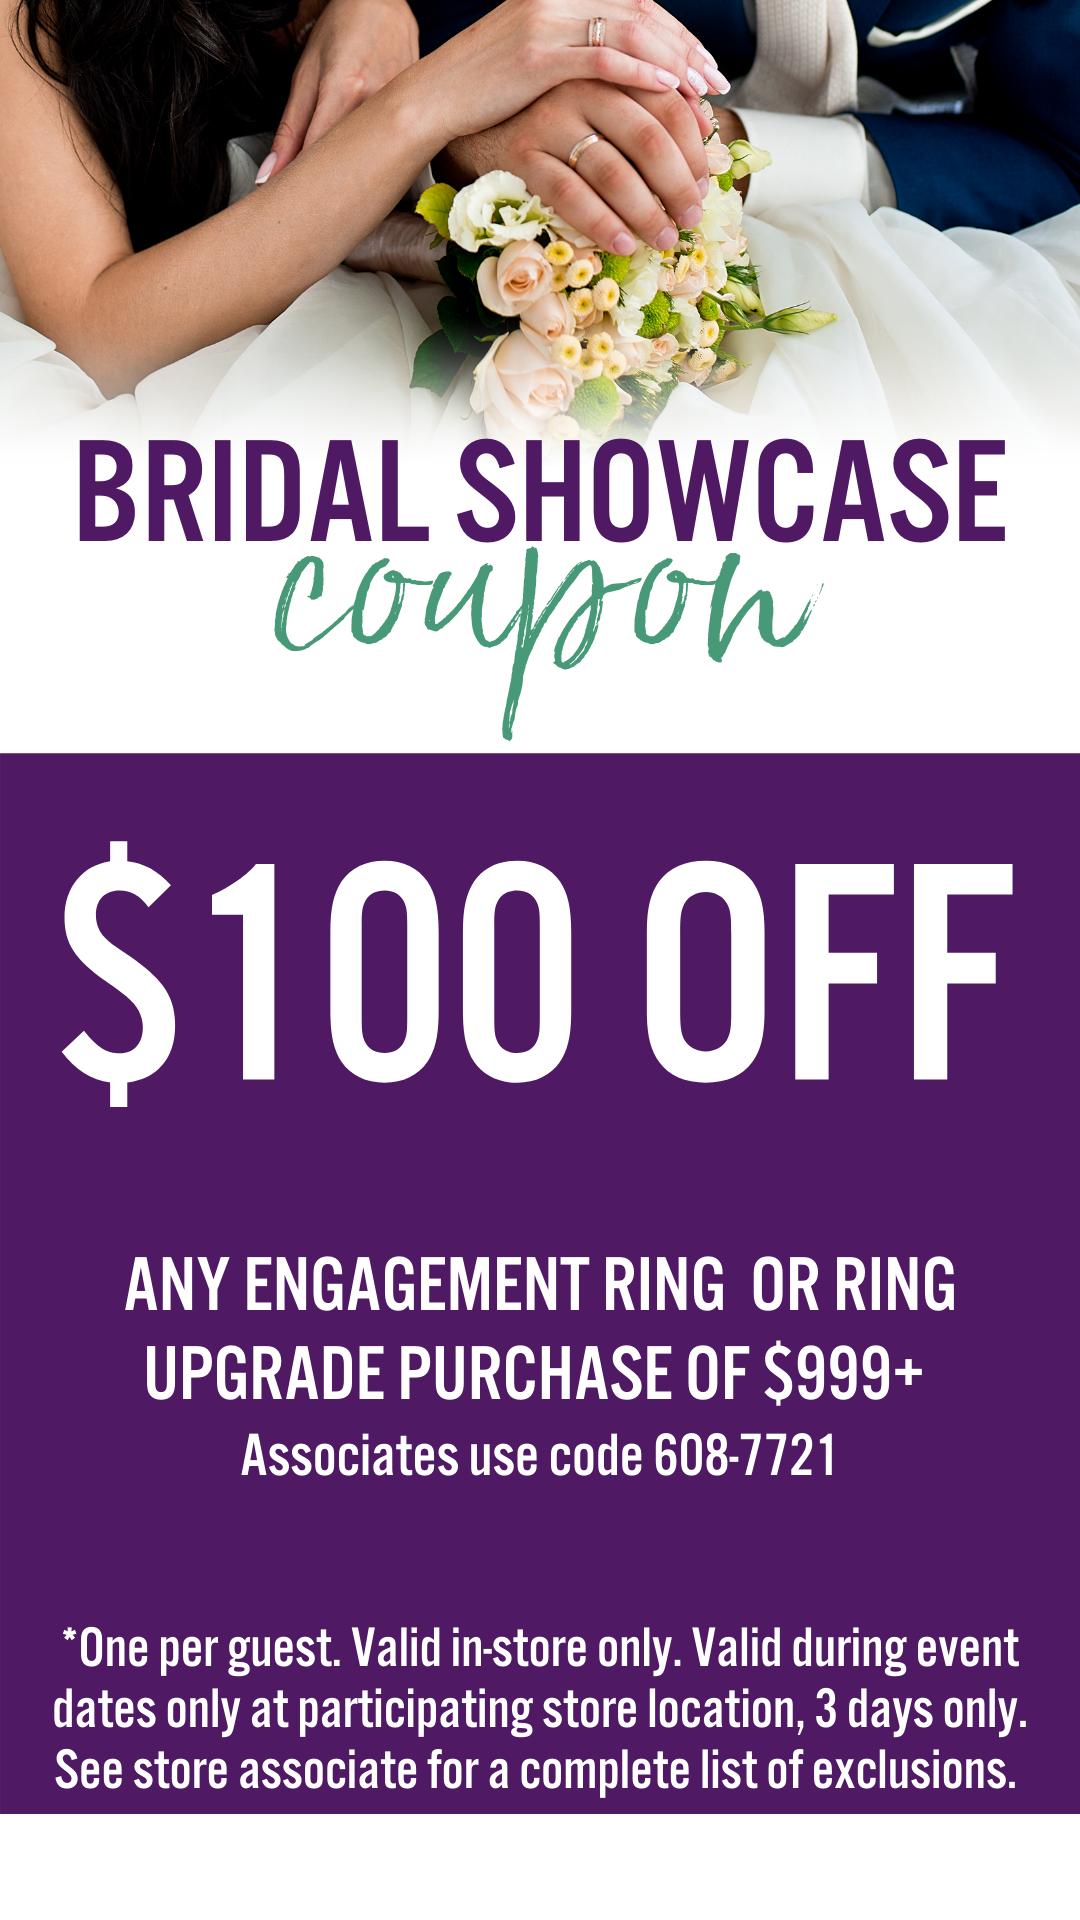 Bridal Showcase, Mobile Insider Coupon